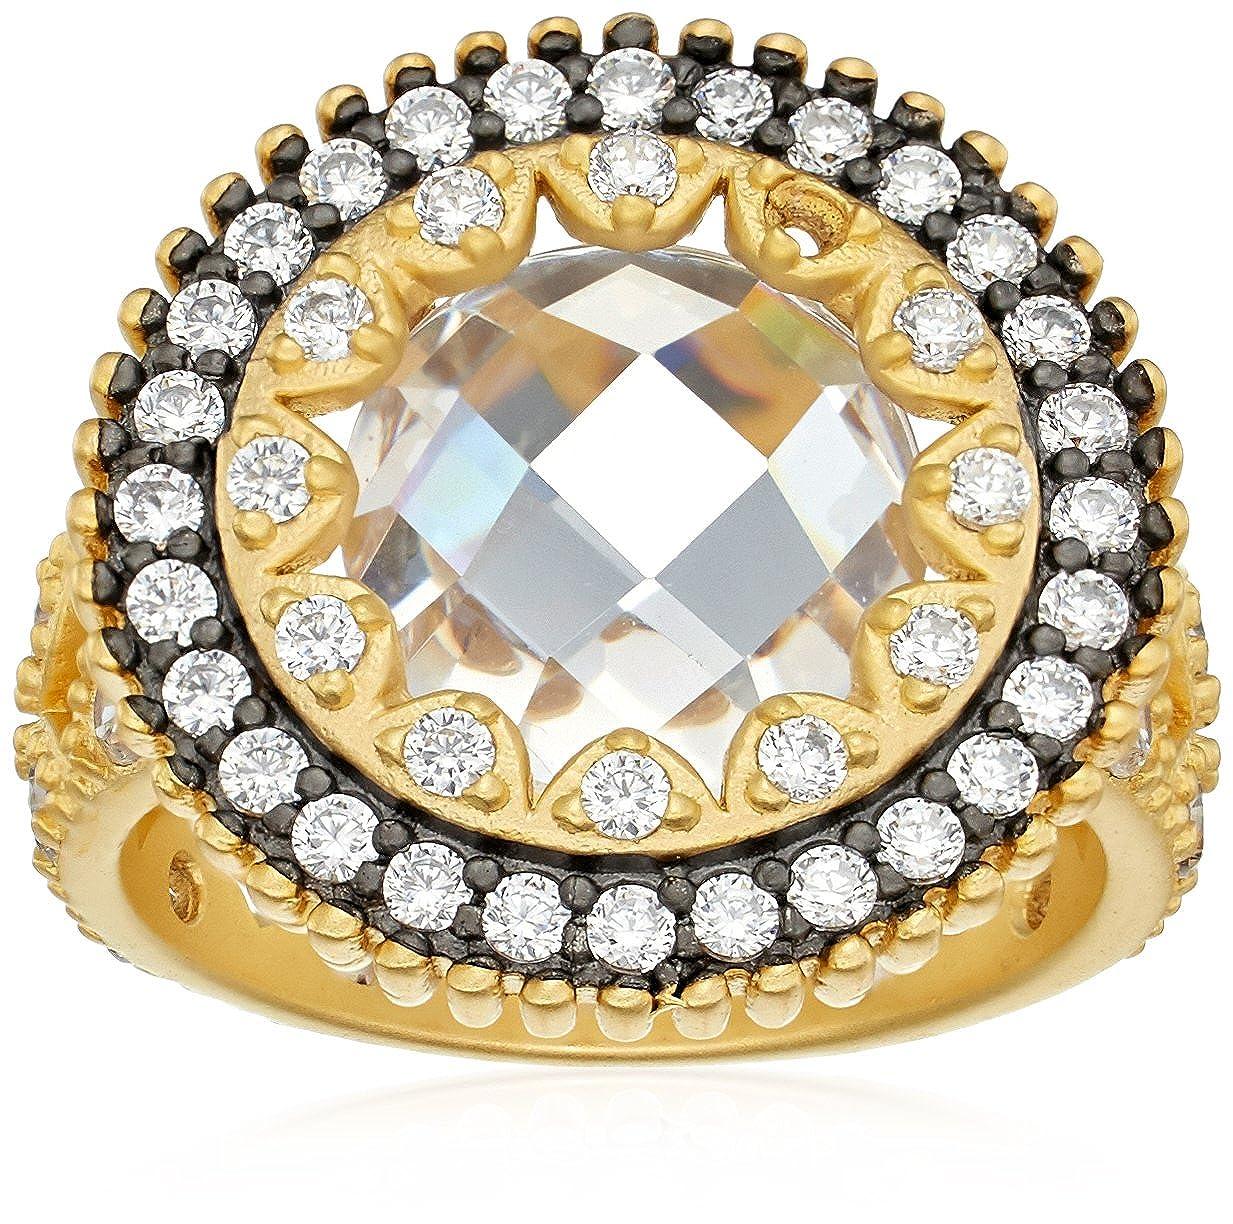 Freida Rothman Womens Signature Round Crown Edge Ring Black & Gold Size 6 YRZR090018B-6